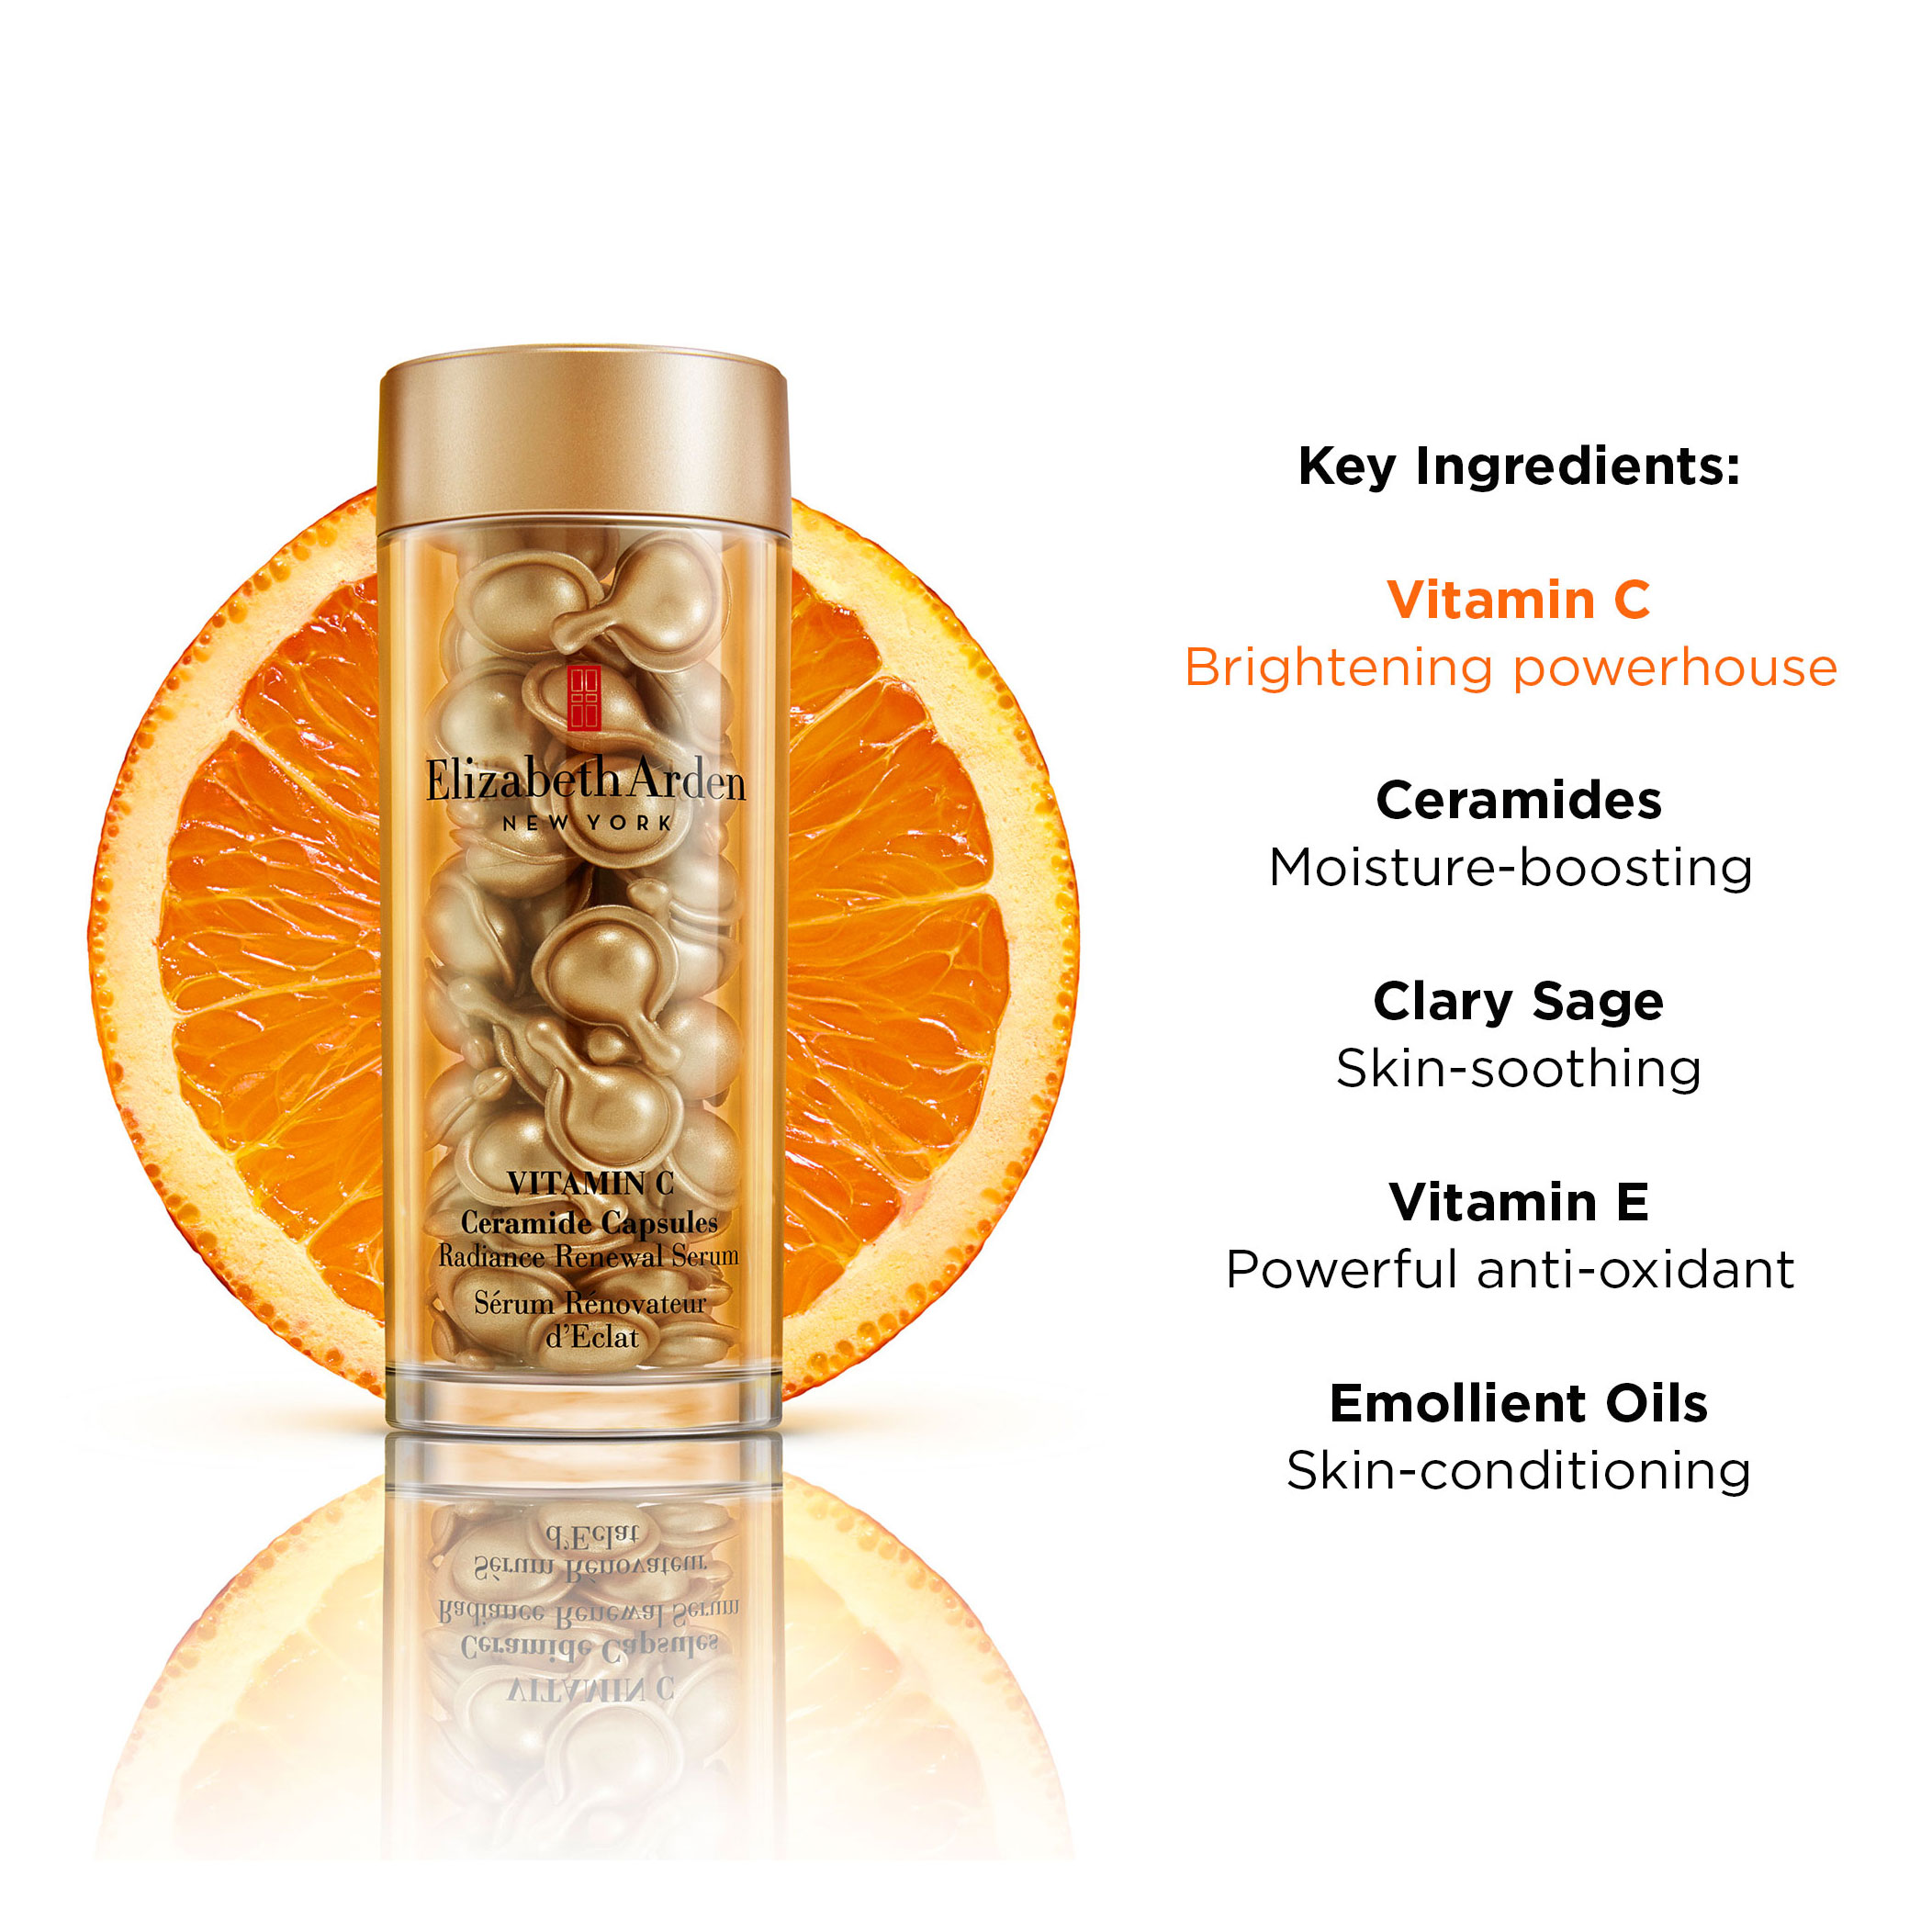 Key Ingredients: Vitamin C (Brightening powerhouse), Ceramides (Moisture-boosting), Clary Sage (Skin-soothing), Vitamin E (Powerful Anti-Oxidant), Emollient Oils (Skin-conditioning)